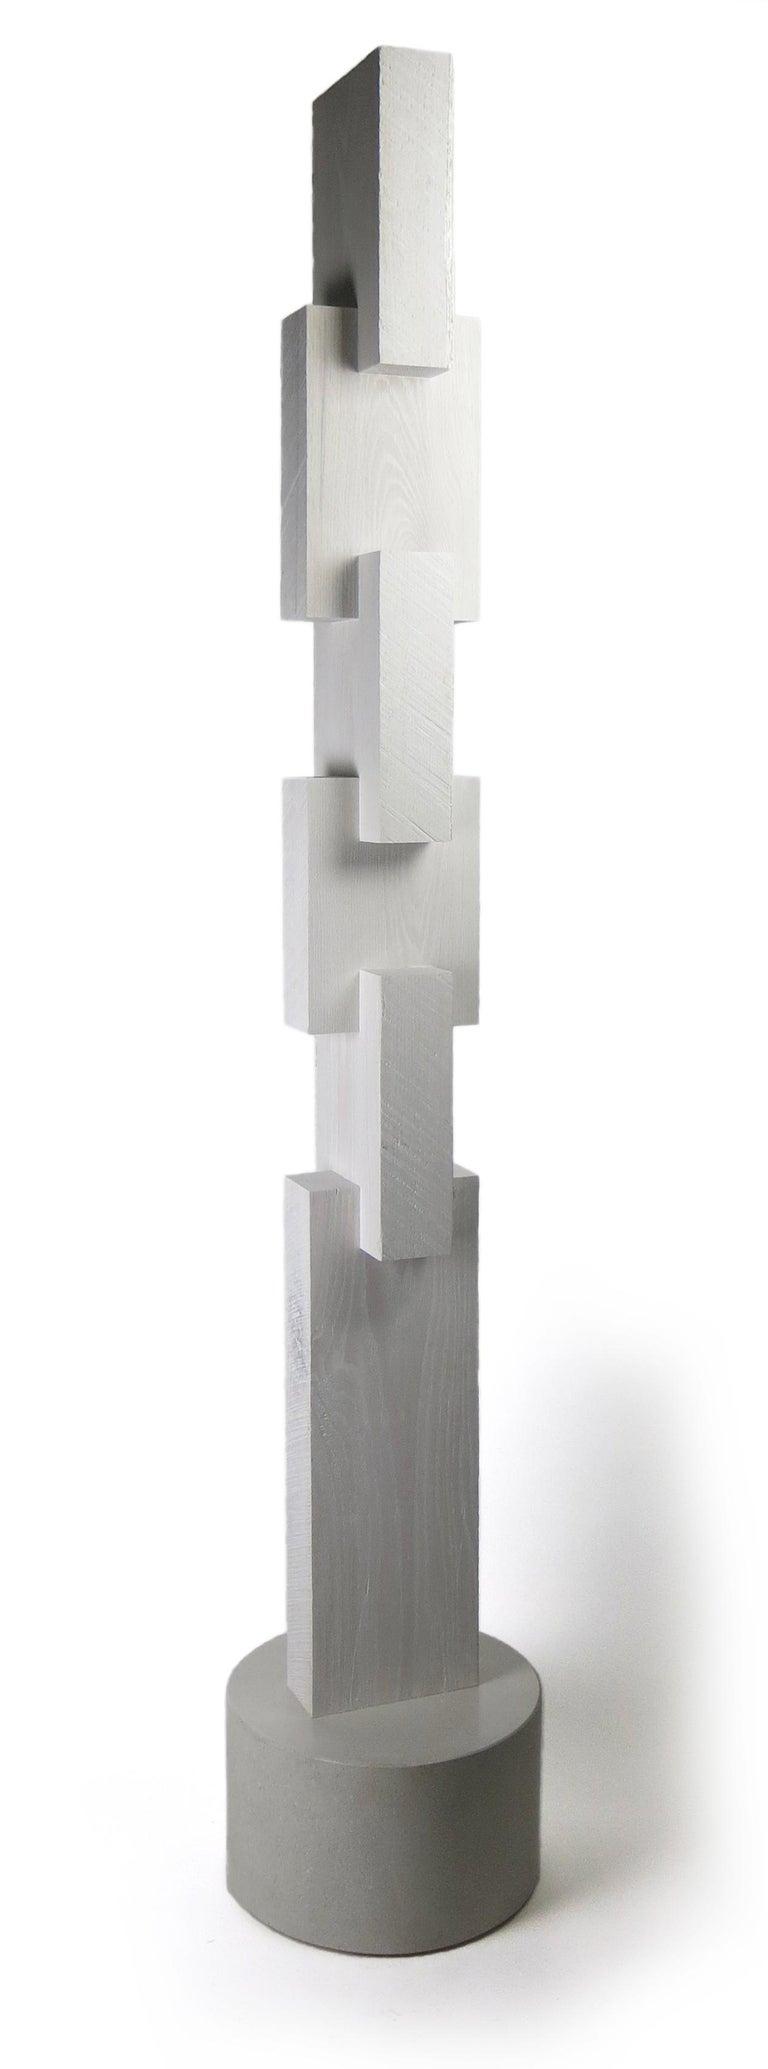 Joel Urruty Still-Life Sculpture - White Tower